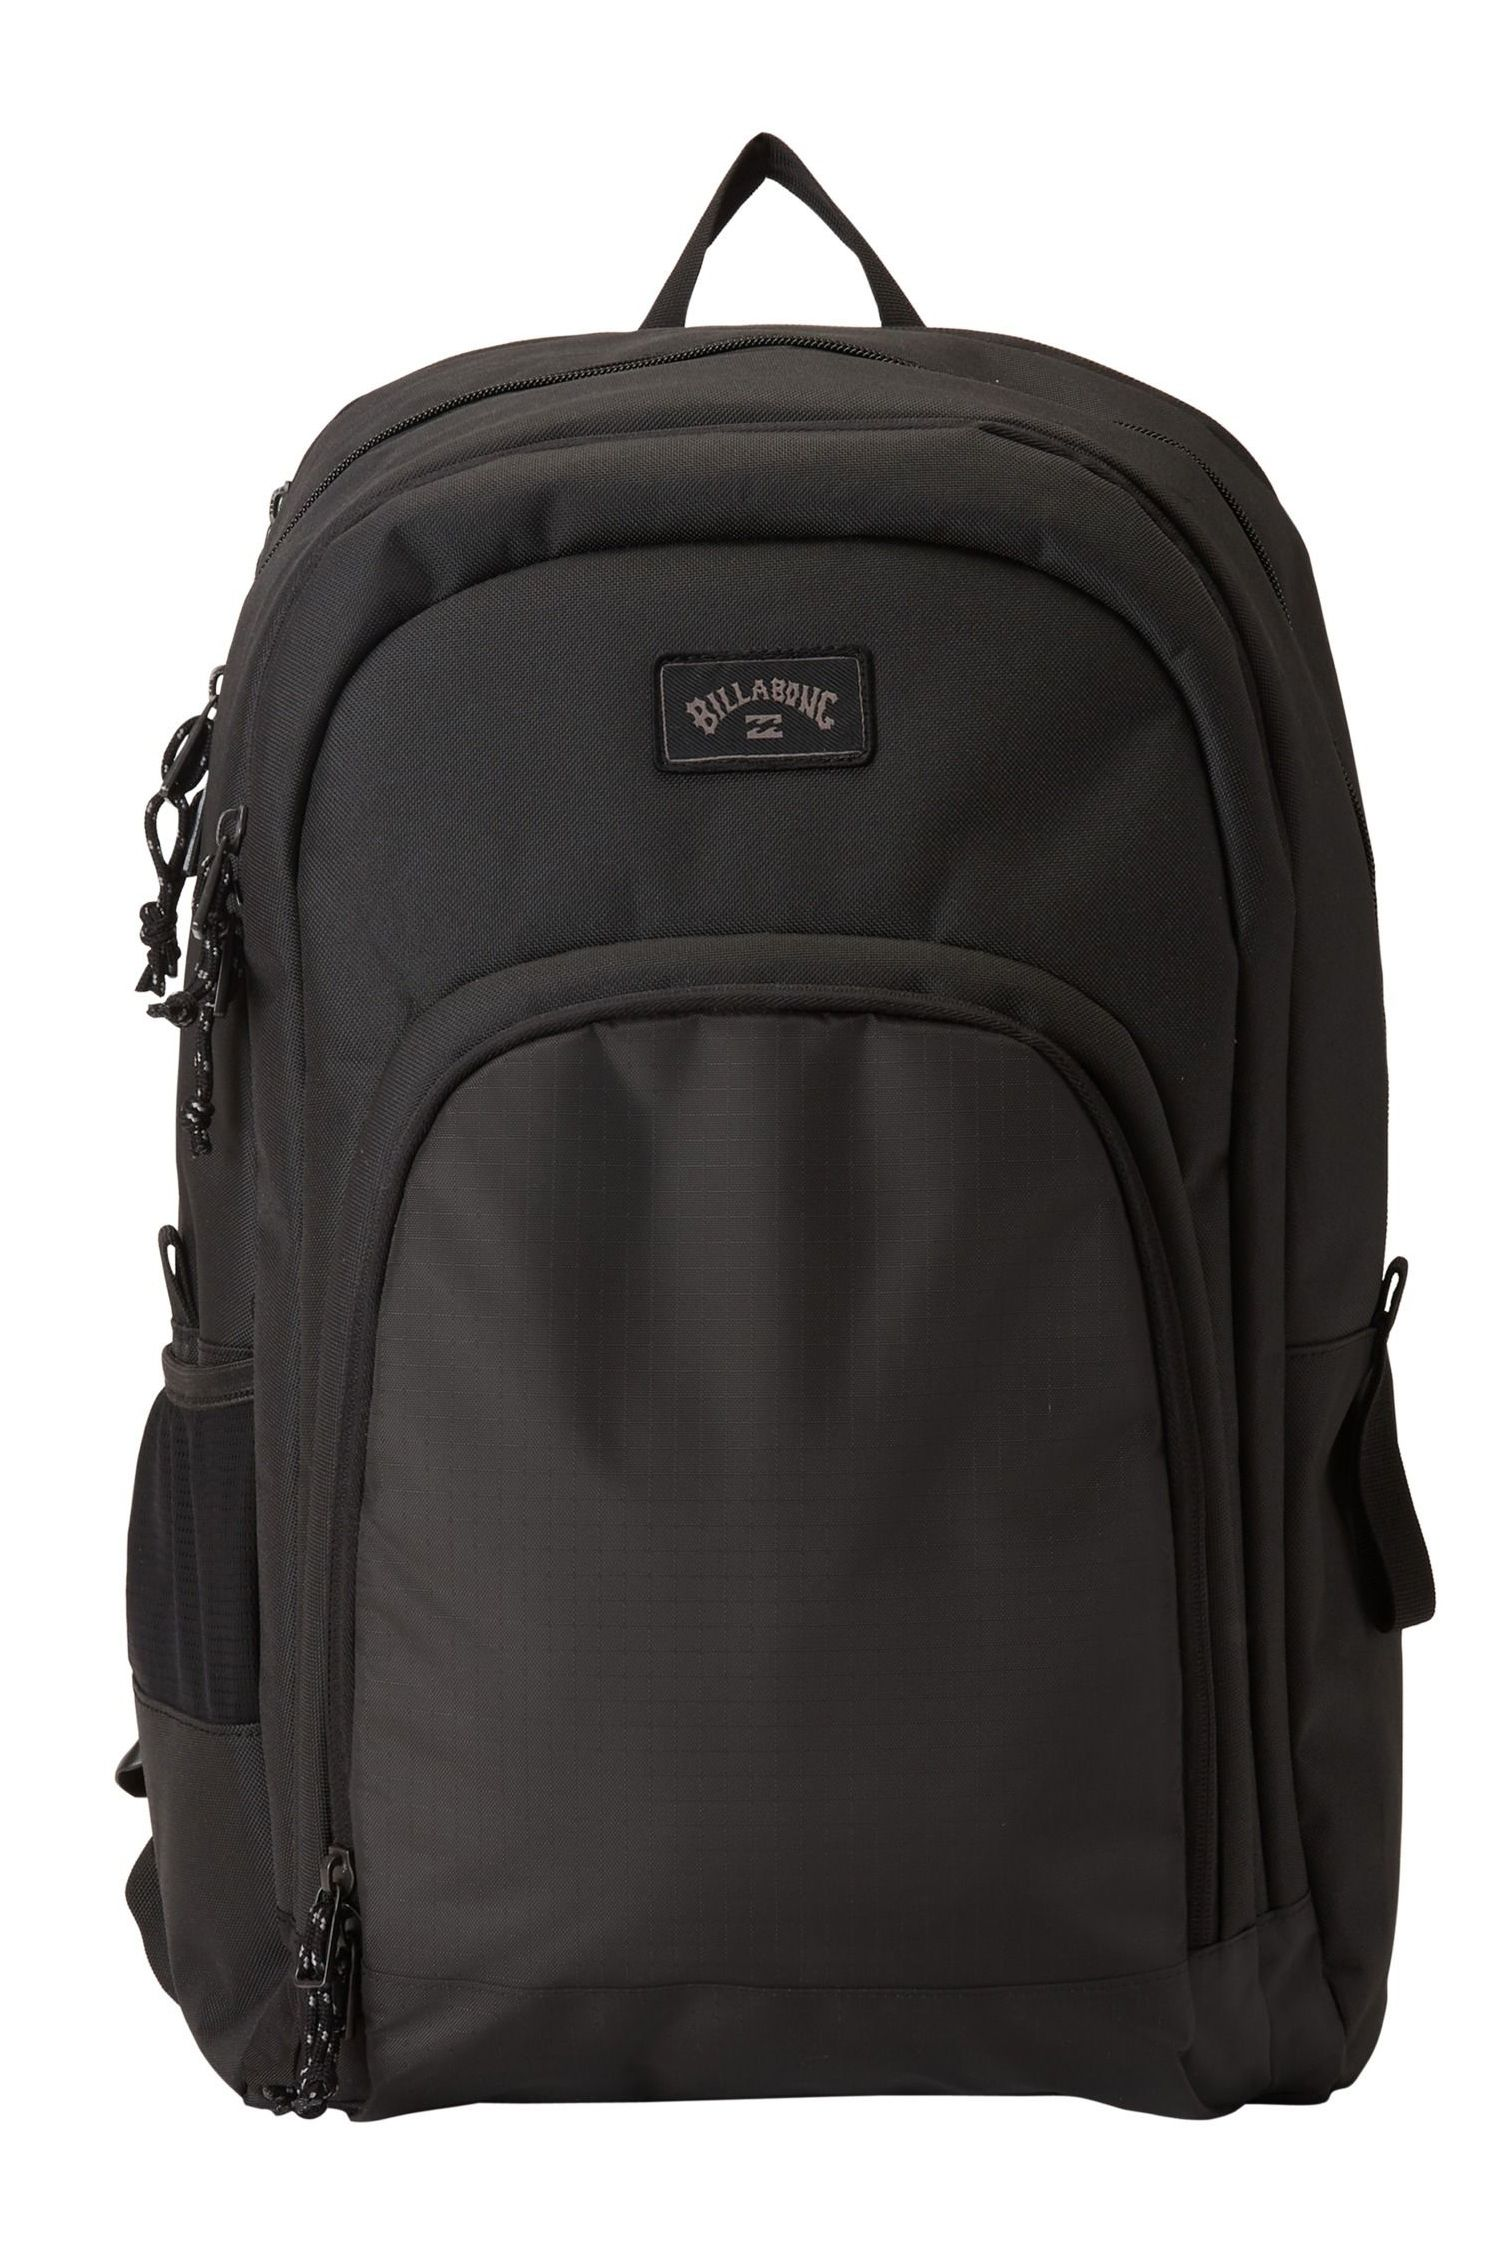 Billabong Backpack COMMAND PACK Stealth